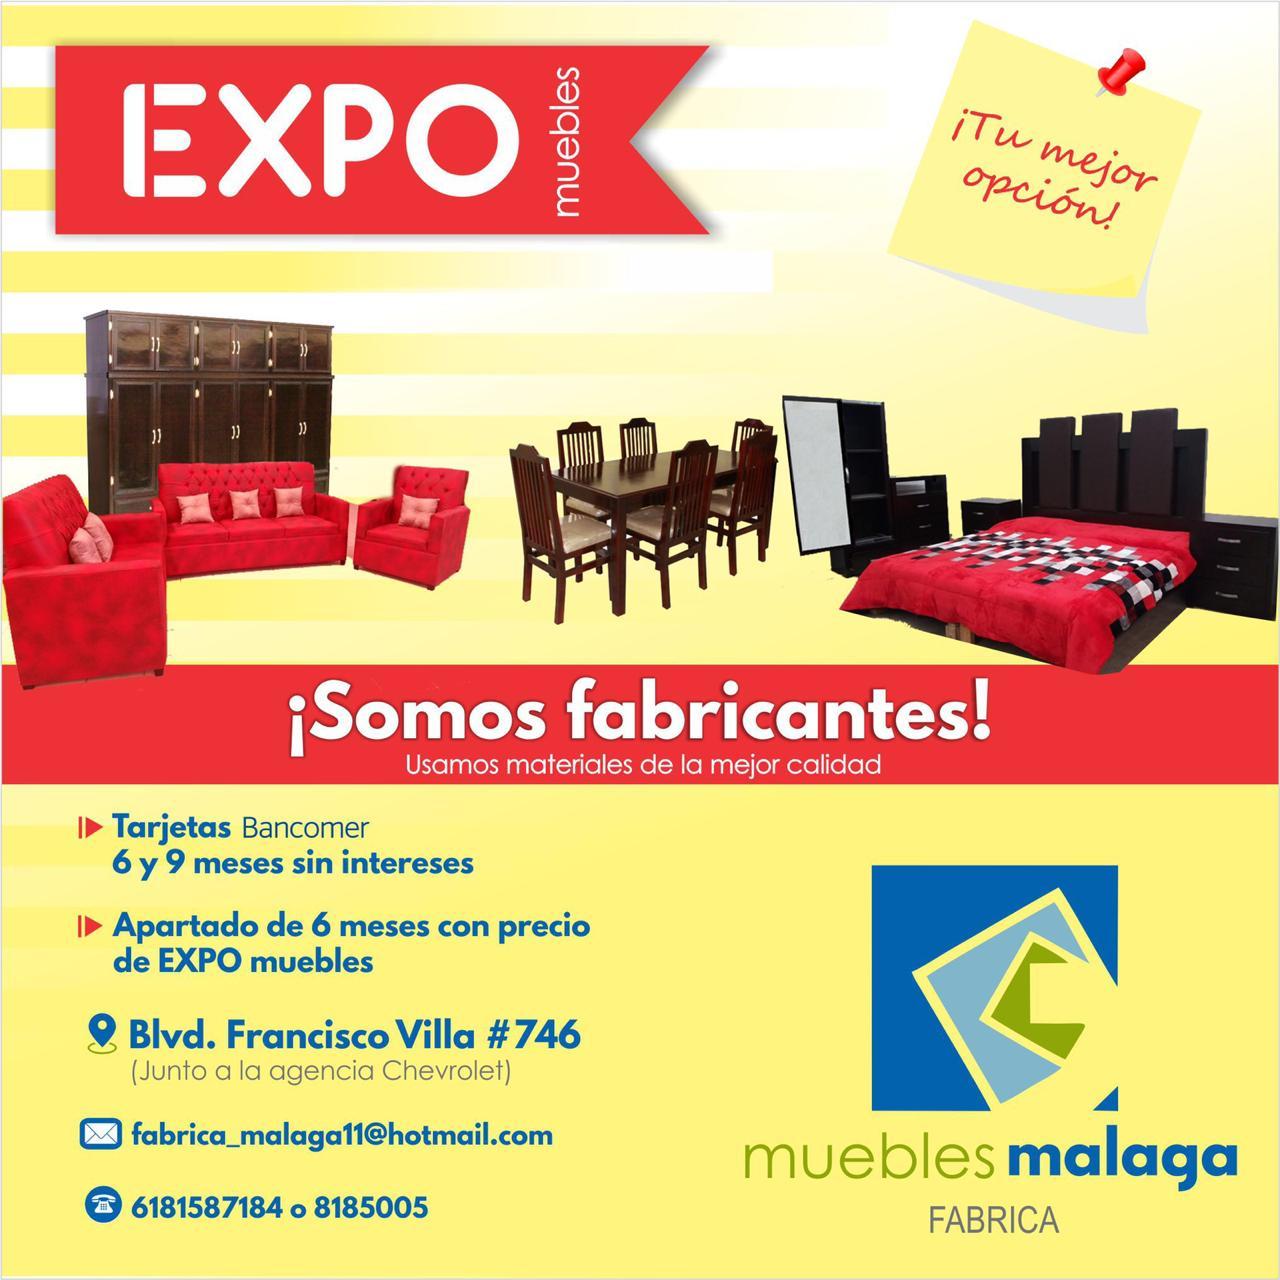 Muebles Malaga | Tel. 618 158 7184